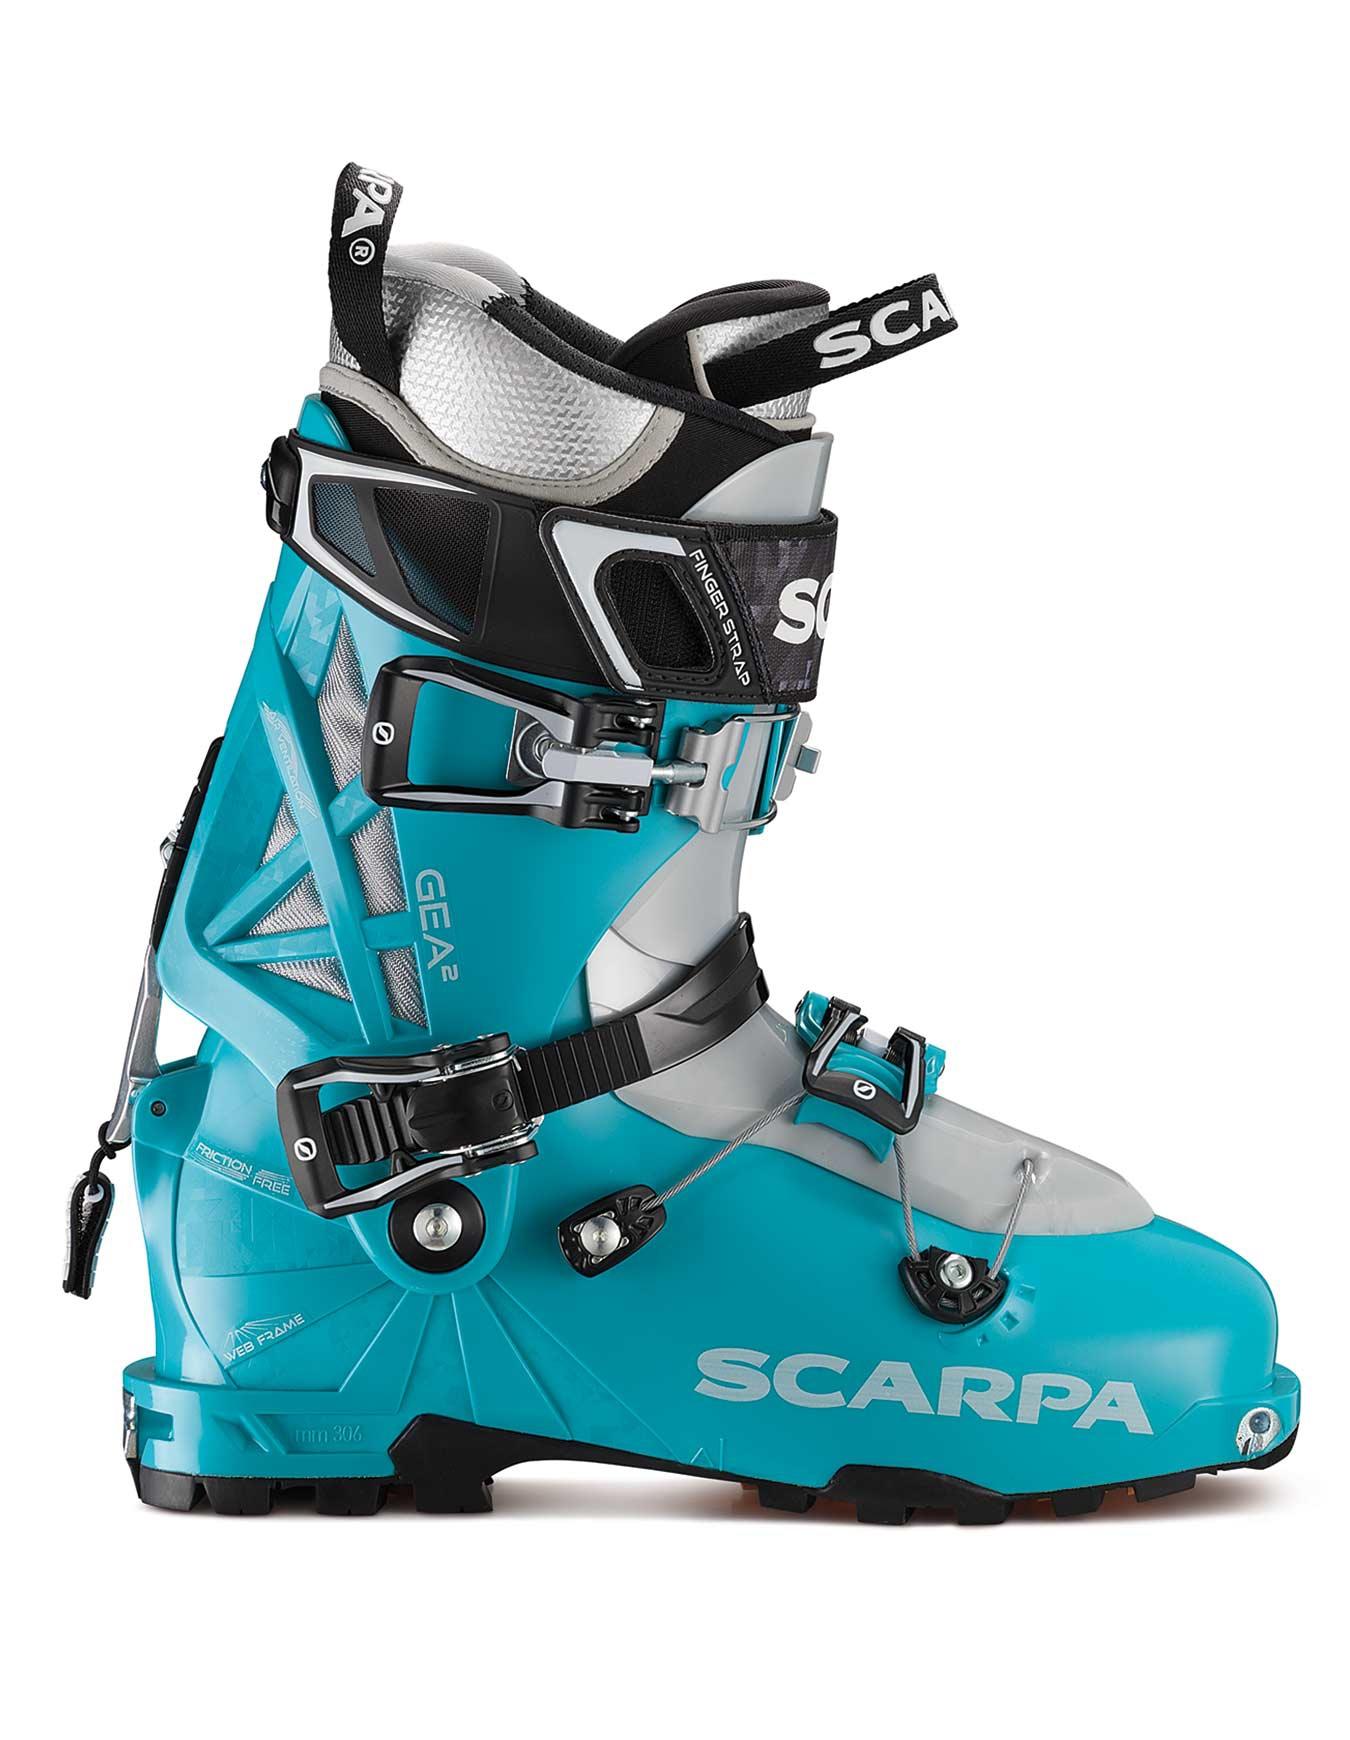 chaussure ski femme scarpa scarpa femme ski chaussure qUMVGSzp